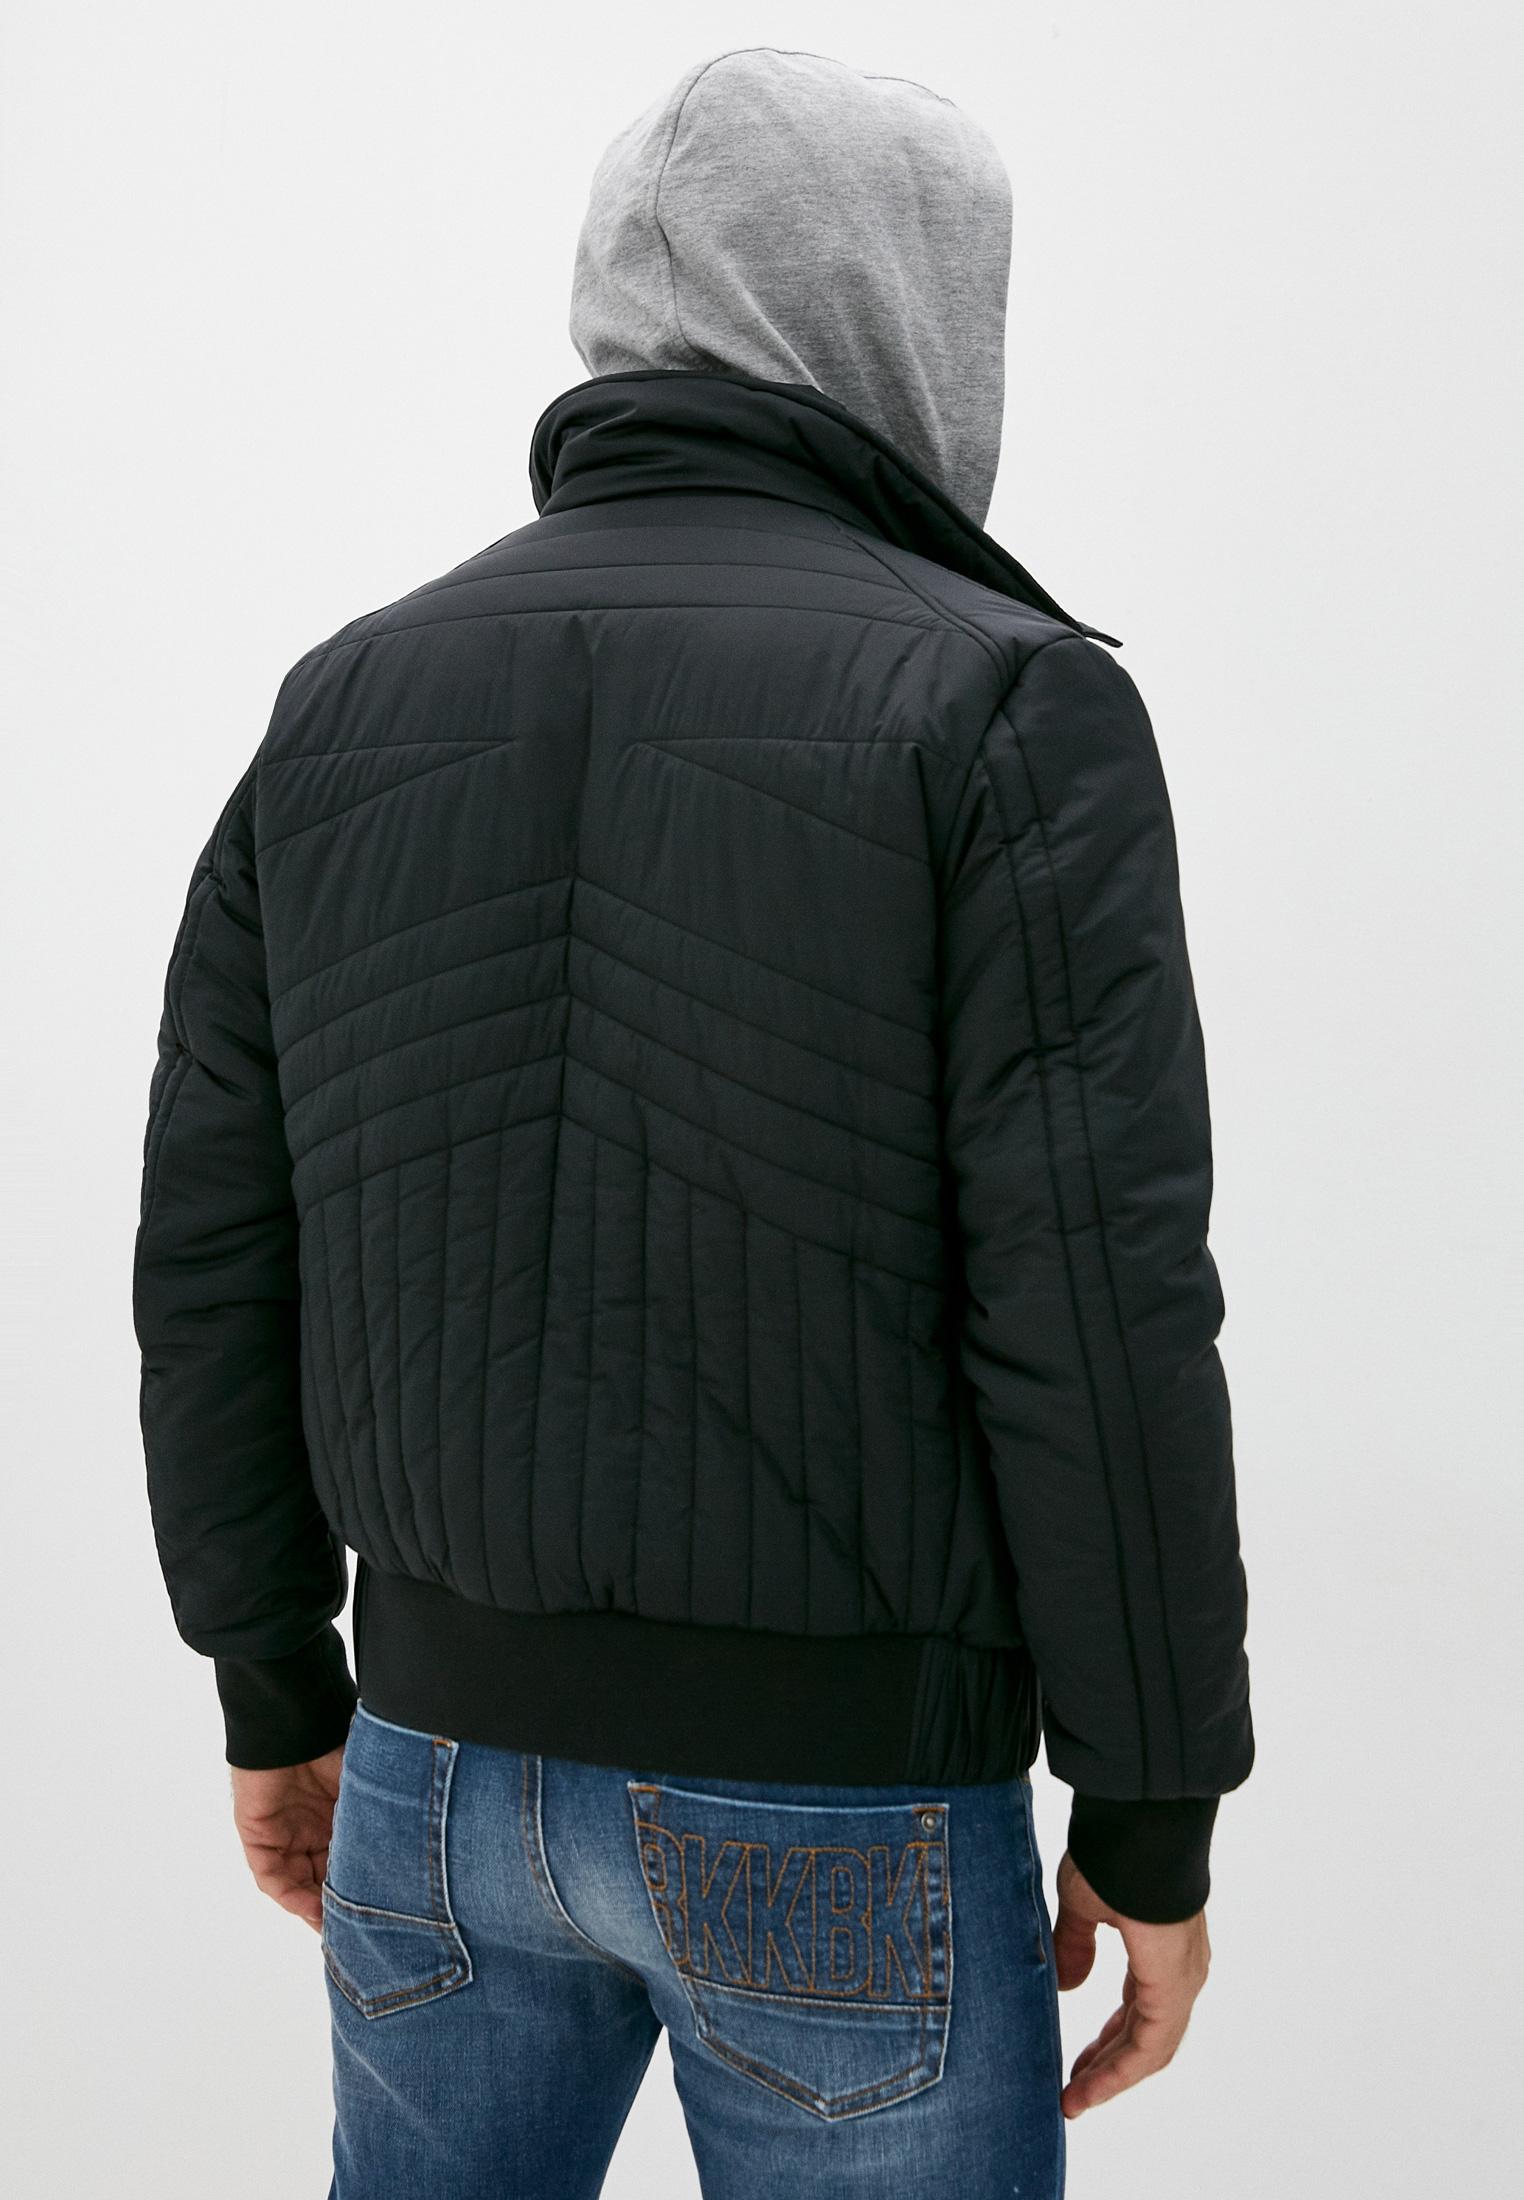 Мужская куртка Bikkembergs (Биккембергс) C H 130 00 S 3464: изображение 4